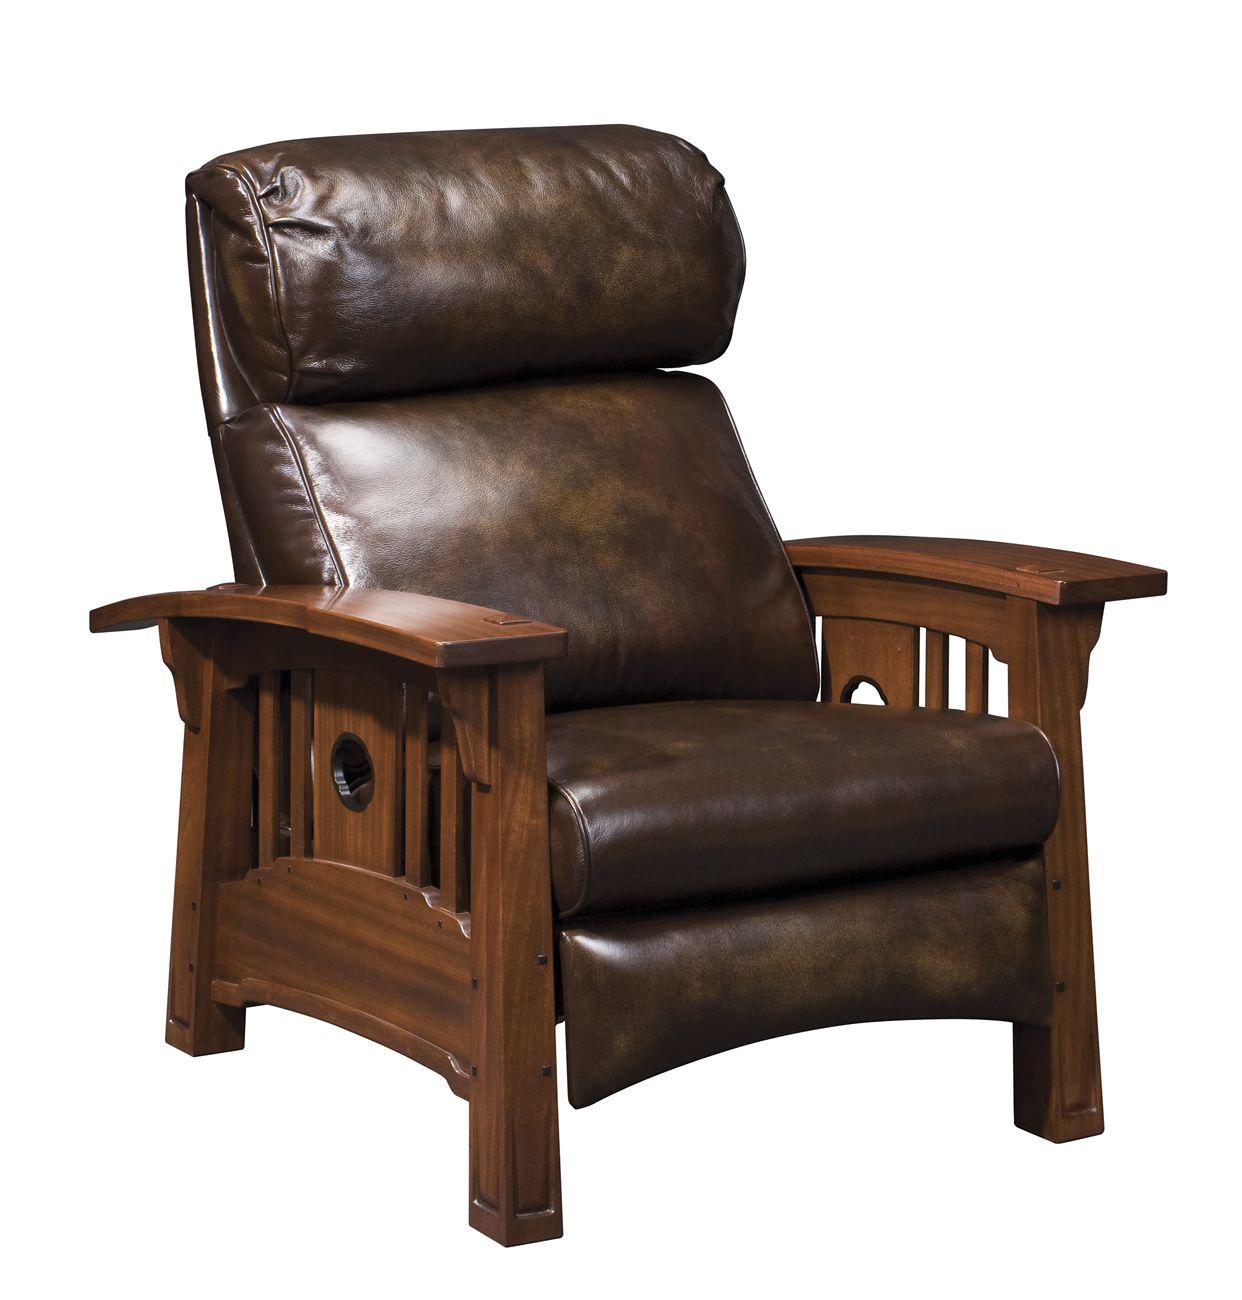 stickley furniture tsuba bustle back recliner - Mission Style Recliner